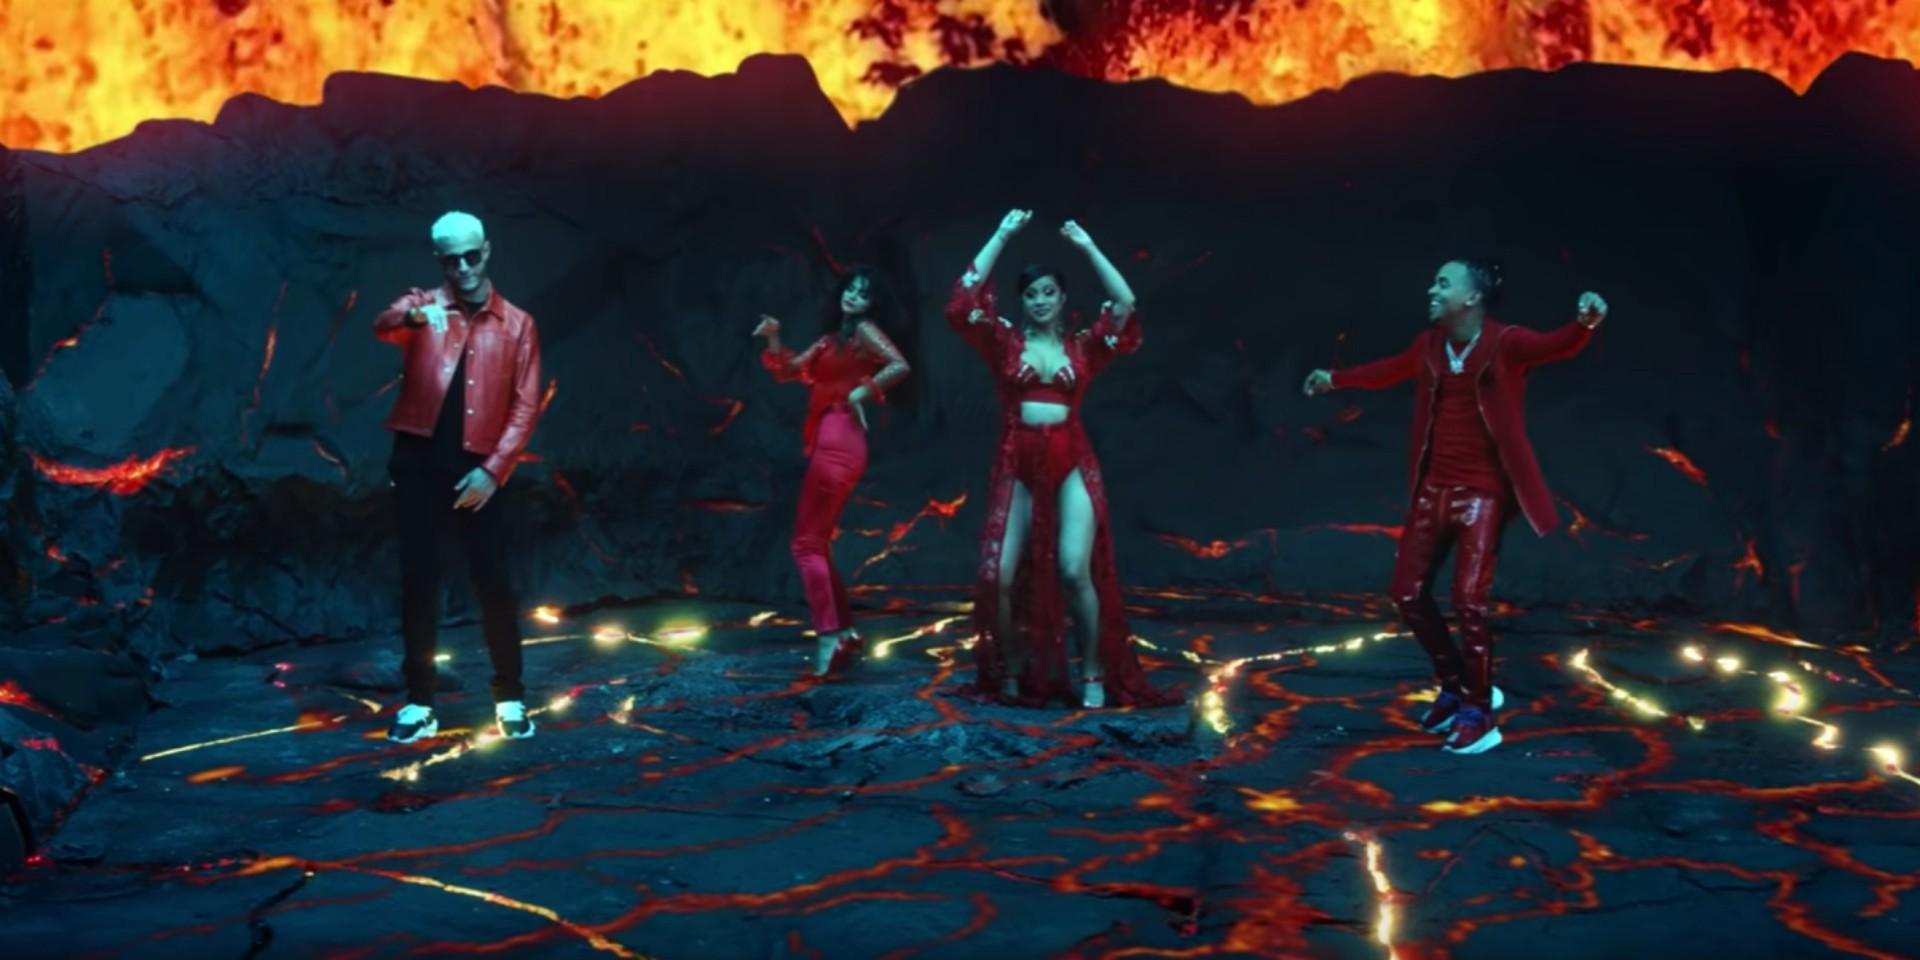 DJ Snake releases visually stunning music video for 'Taki Taki feat. Cardi B, Selena Gomez and Ozuna'